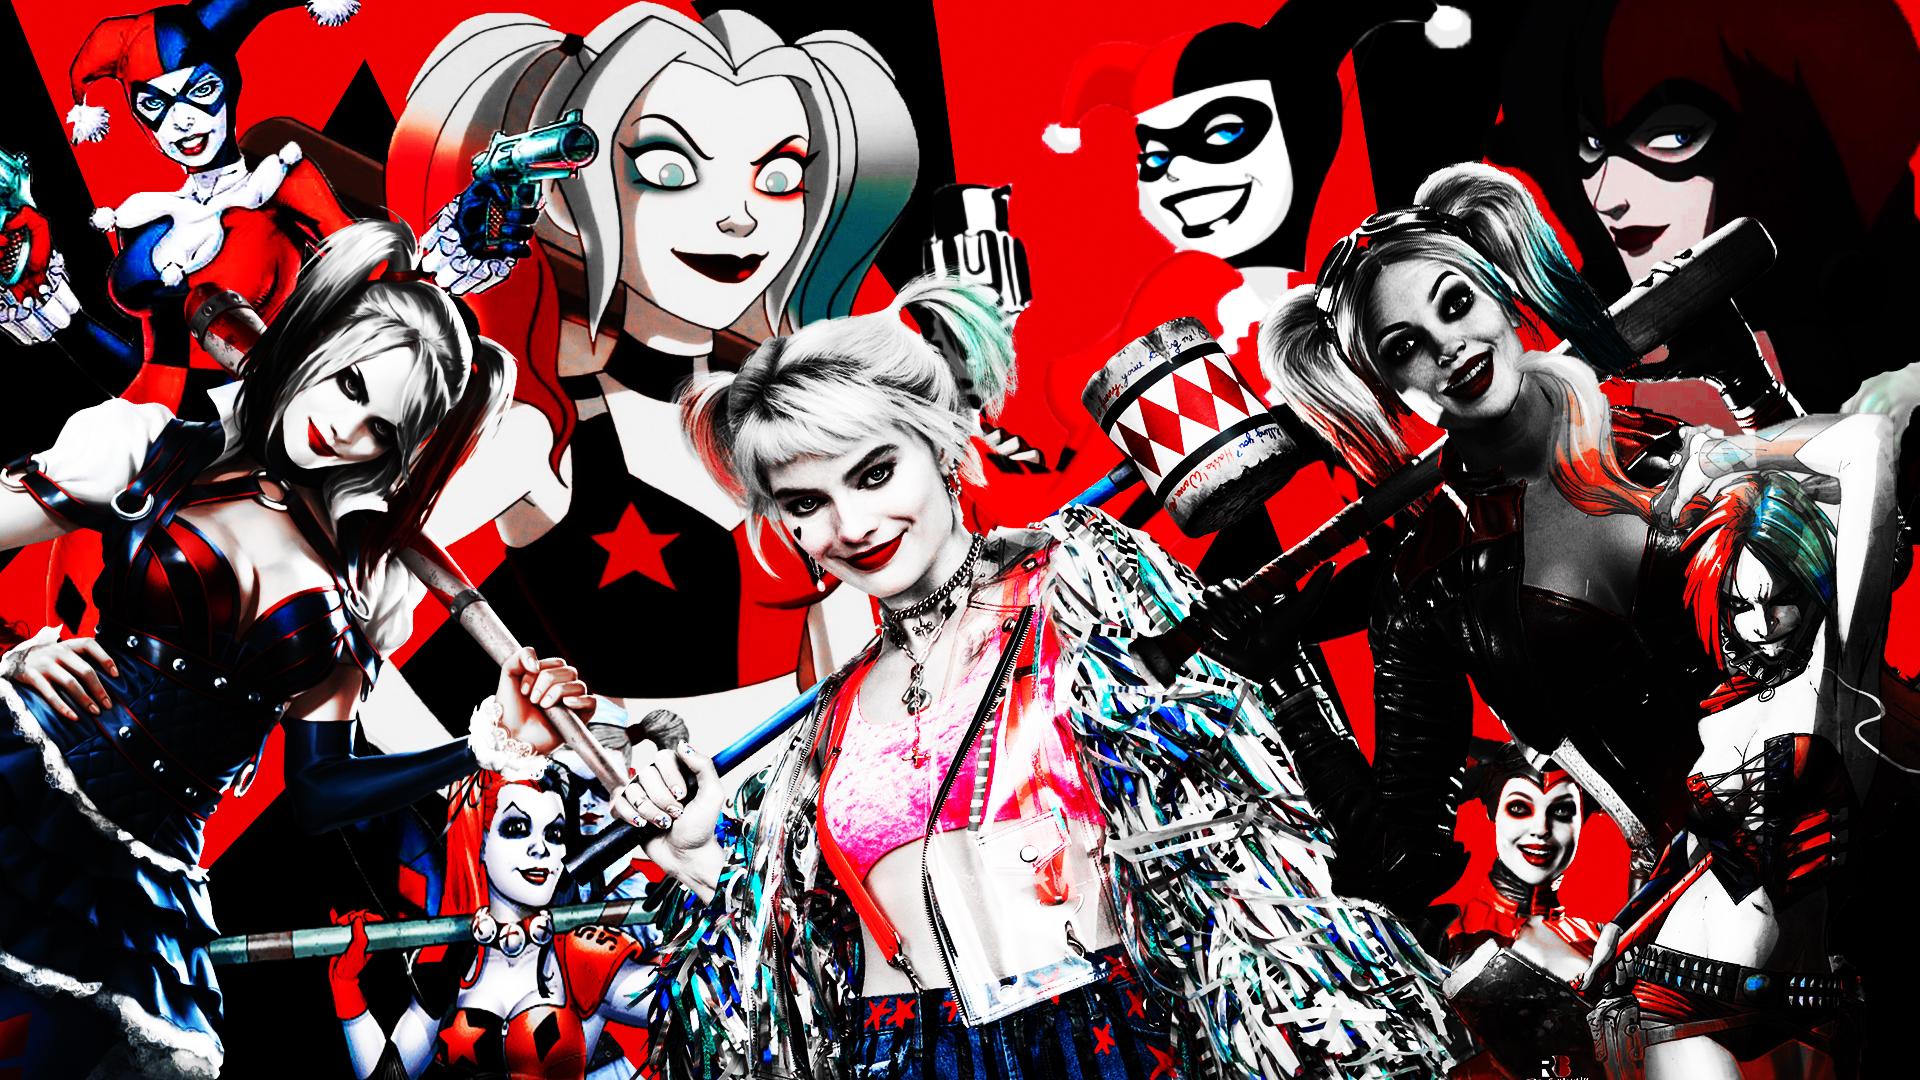 Harley Quinn Wallpaper Hd Wallpaper Background Image 1920x1080 Id 1097068 Wallpaper Abyss